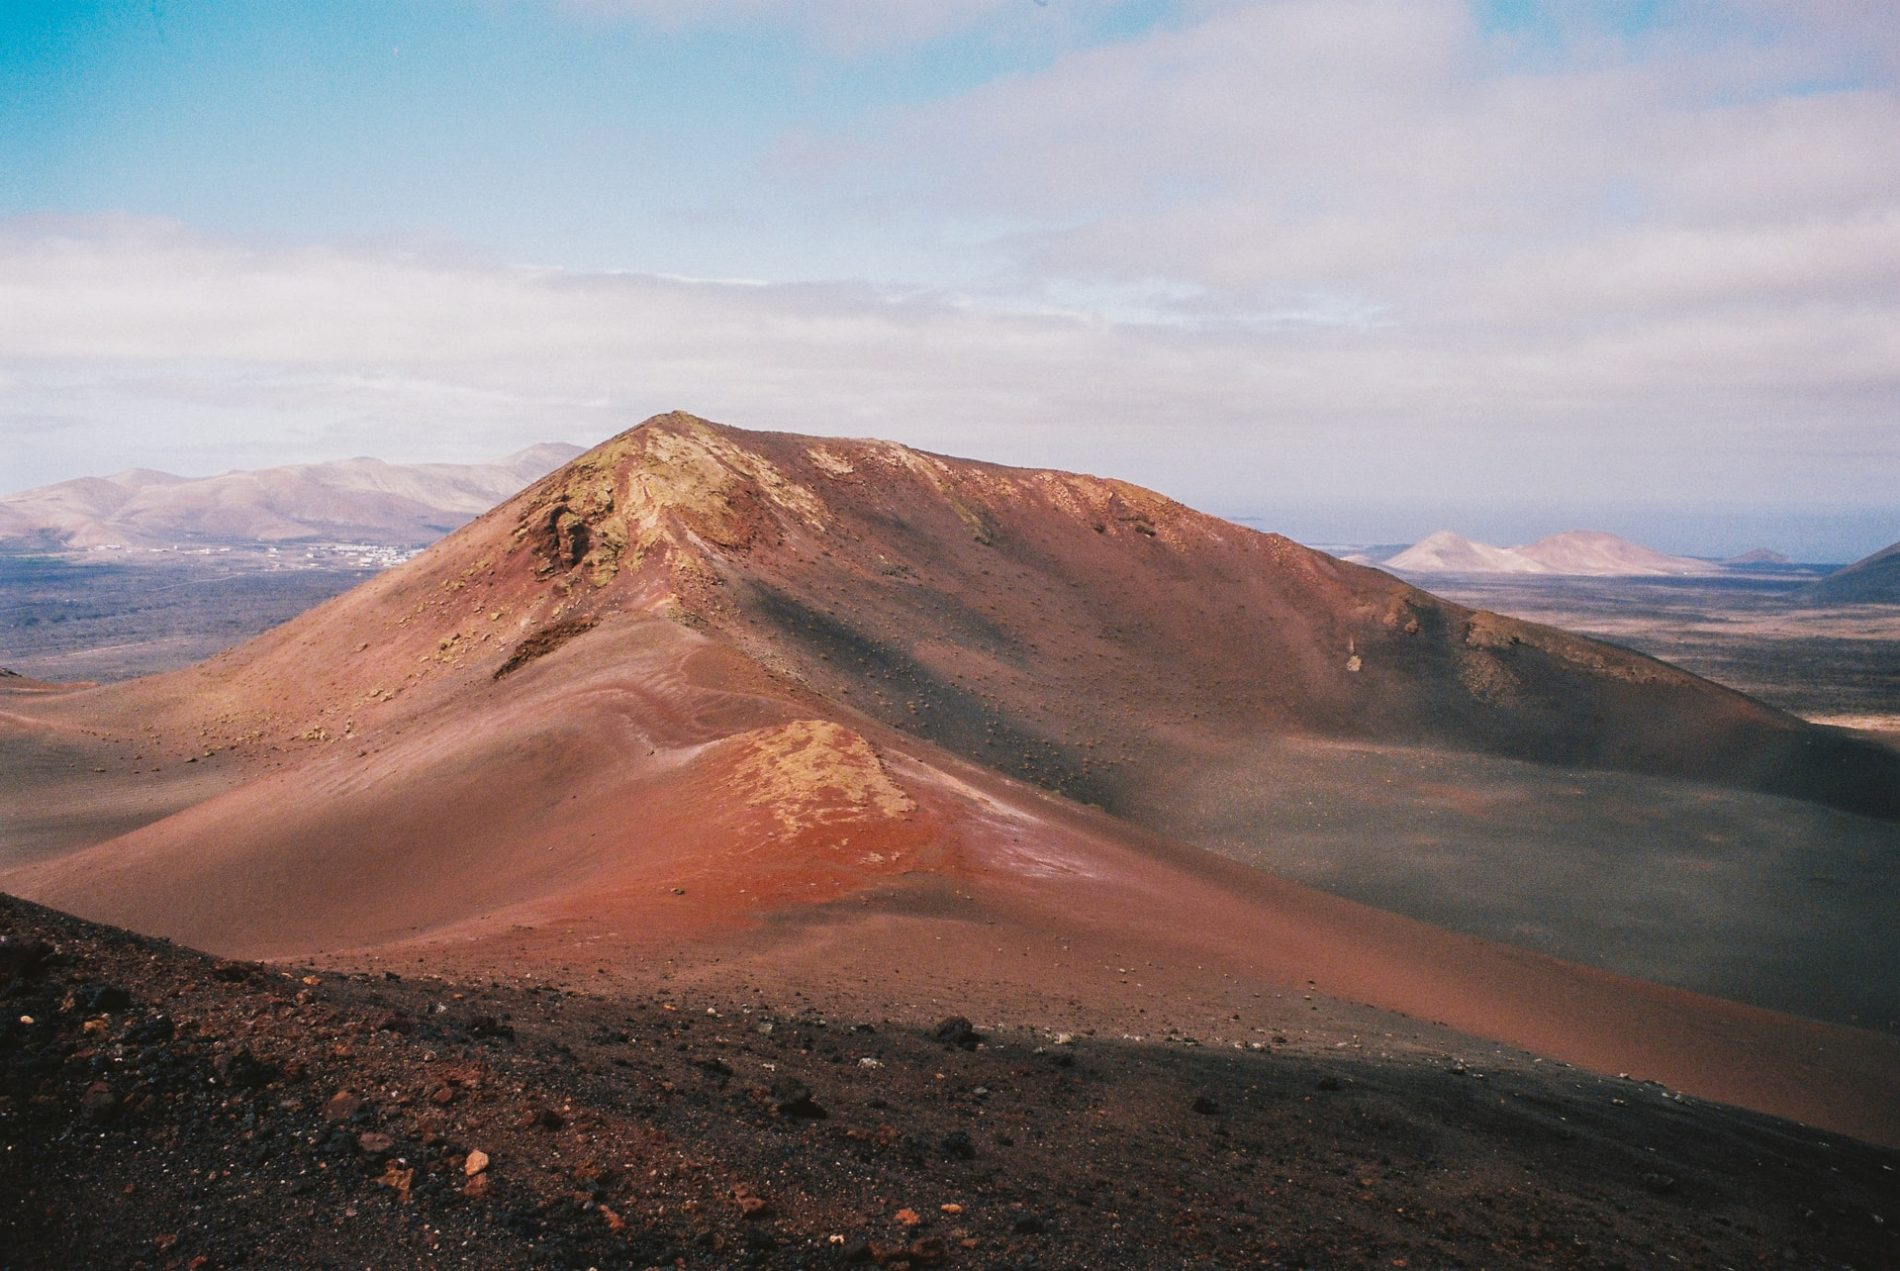 Tymanfaya Lanzarote vulcano